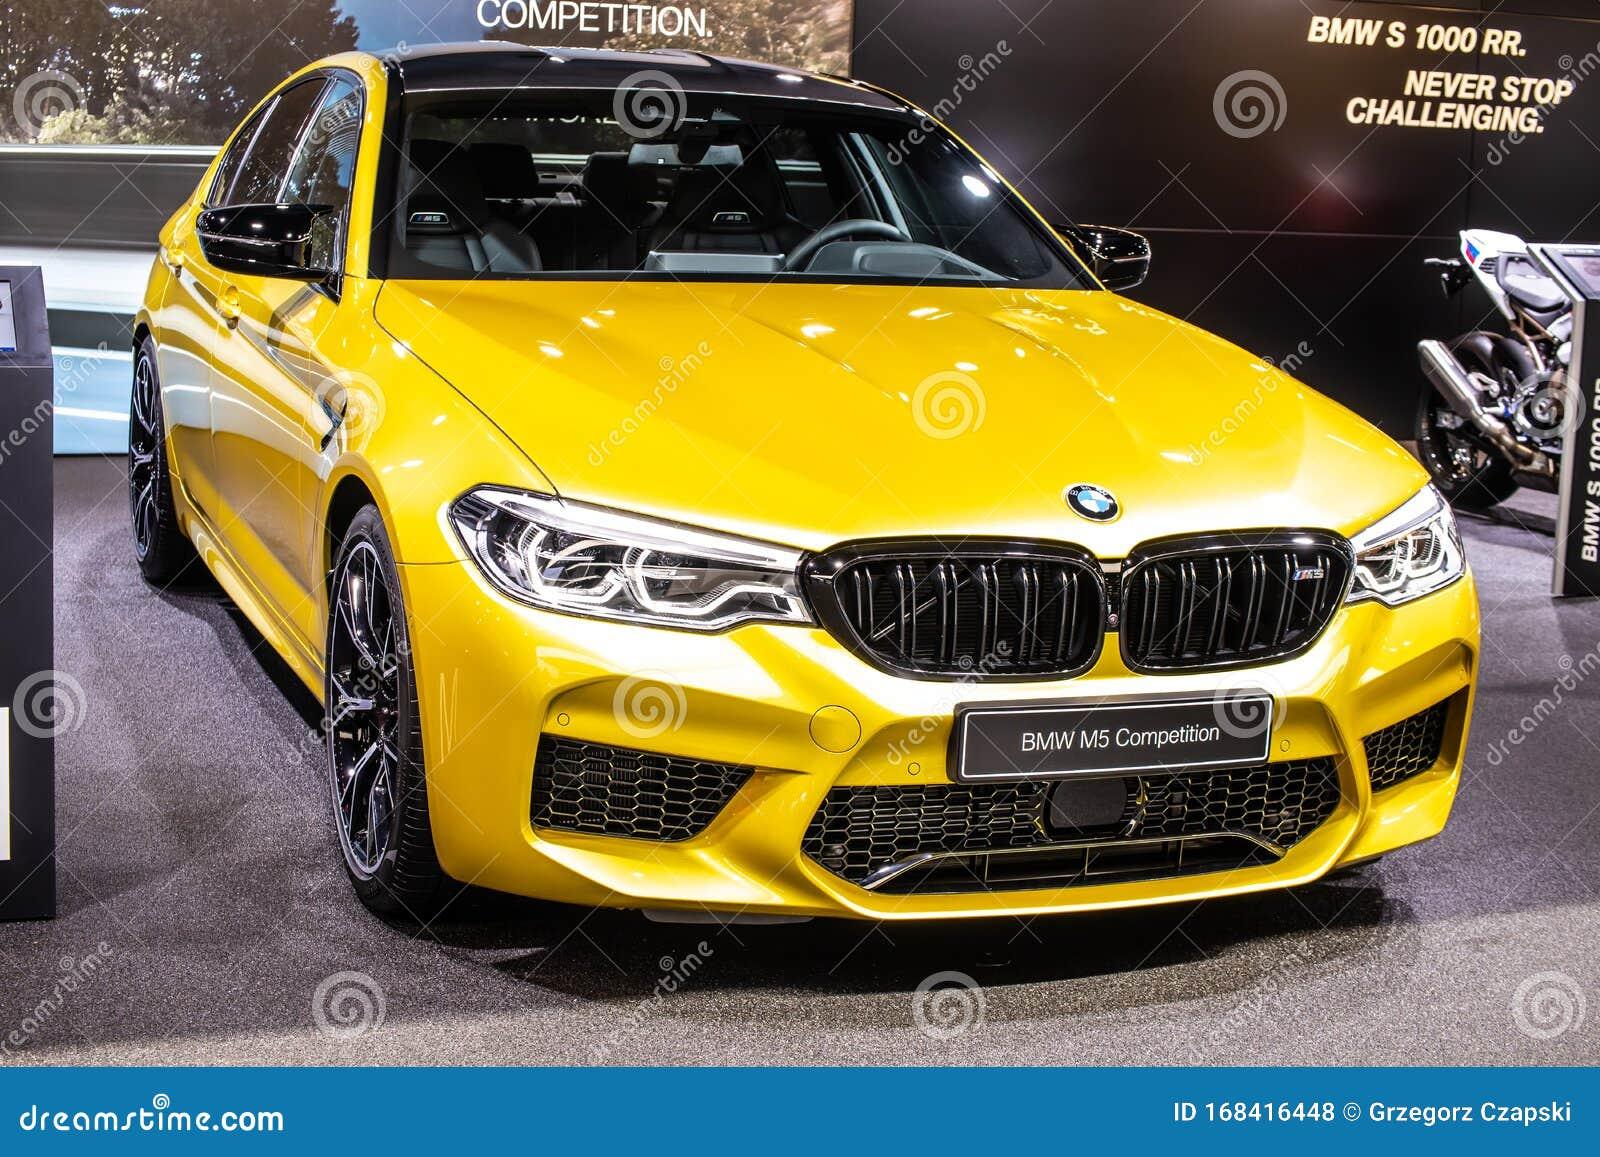 Yellow Bmw M5 Competition Sedan At Geneva International Motor Show F90 M5 Based On G30 5 Series Editorial Stock Photo Image Of Expensive International 168416448